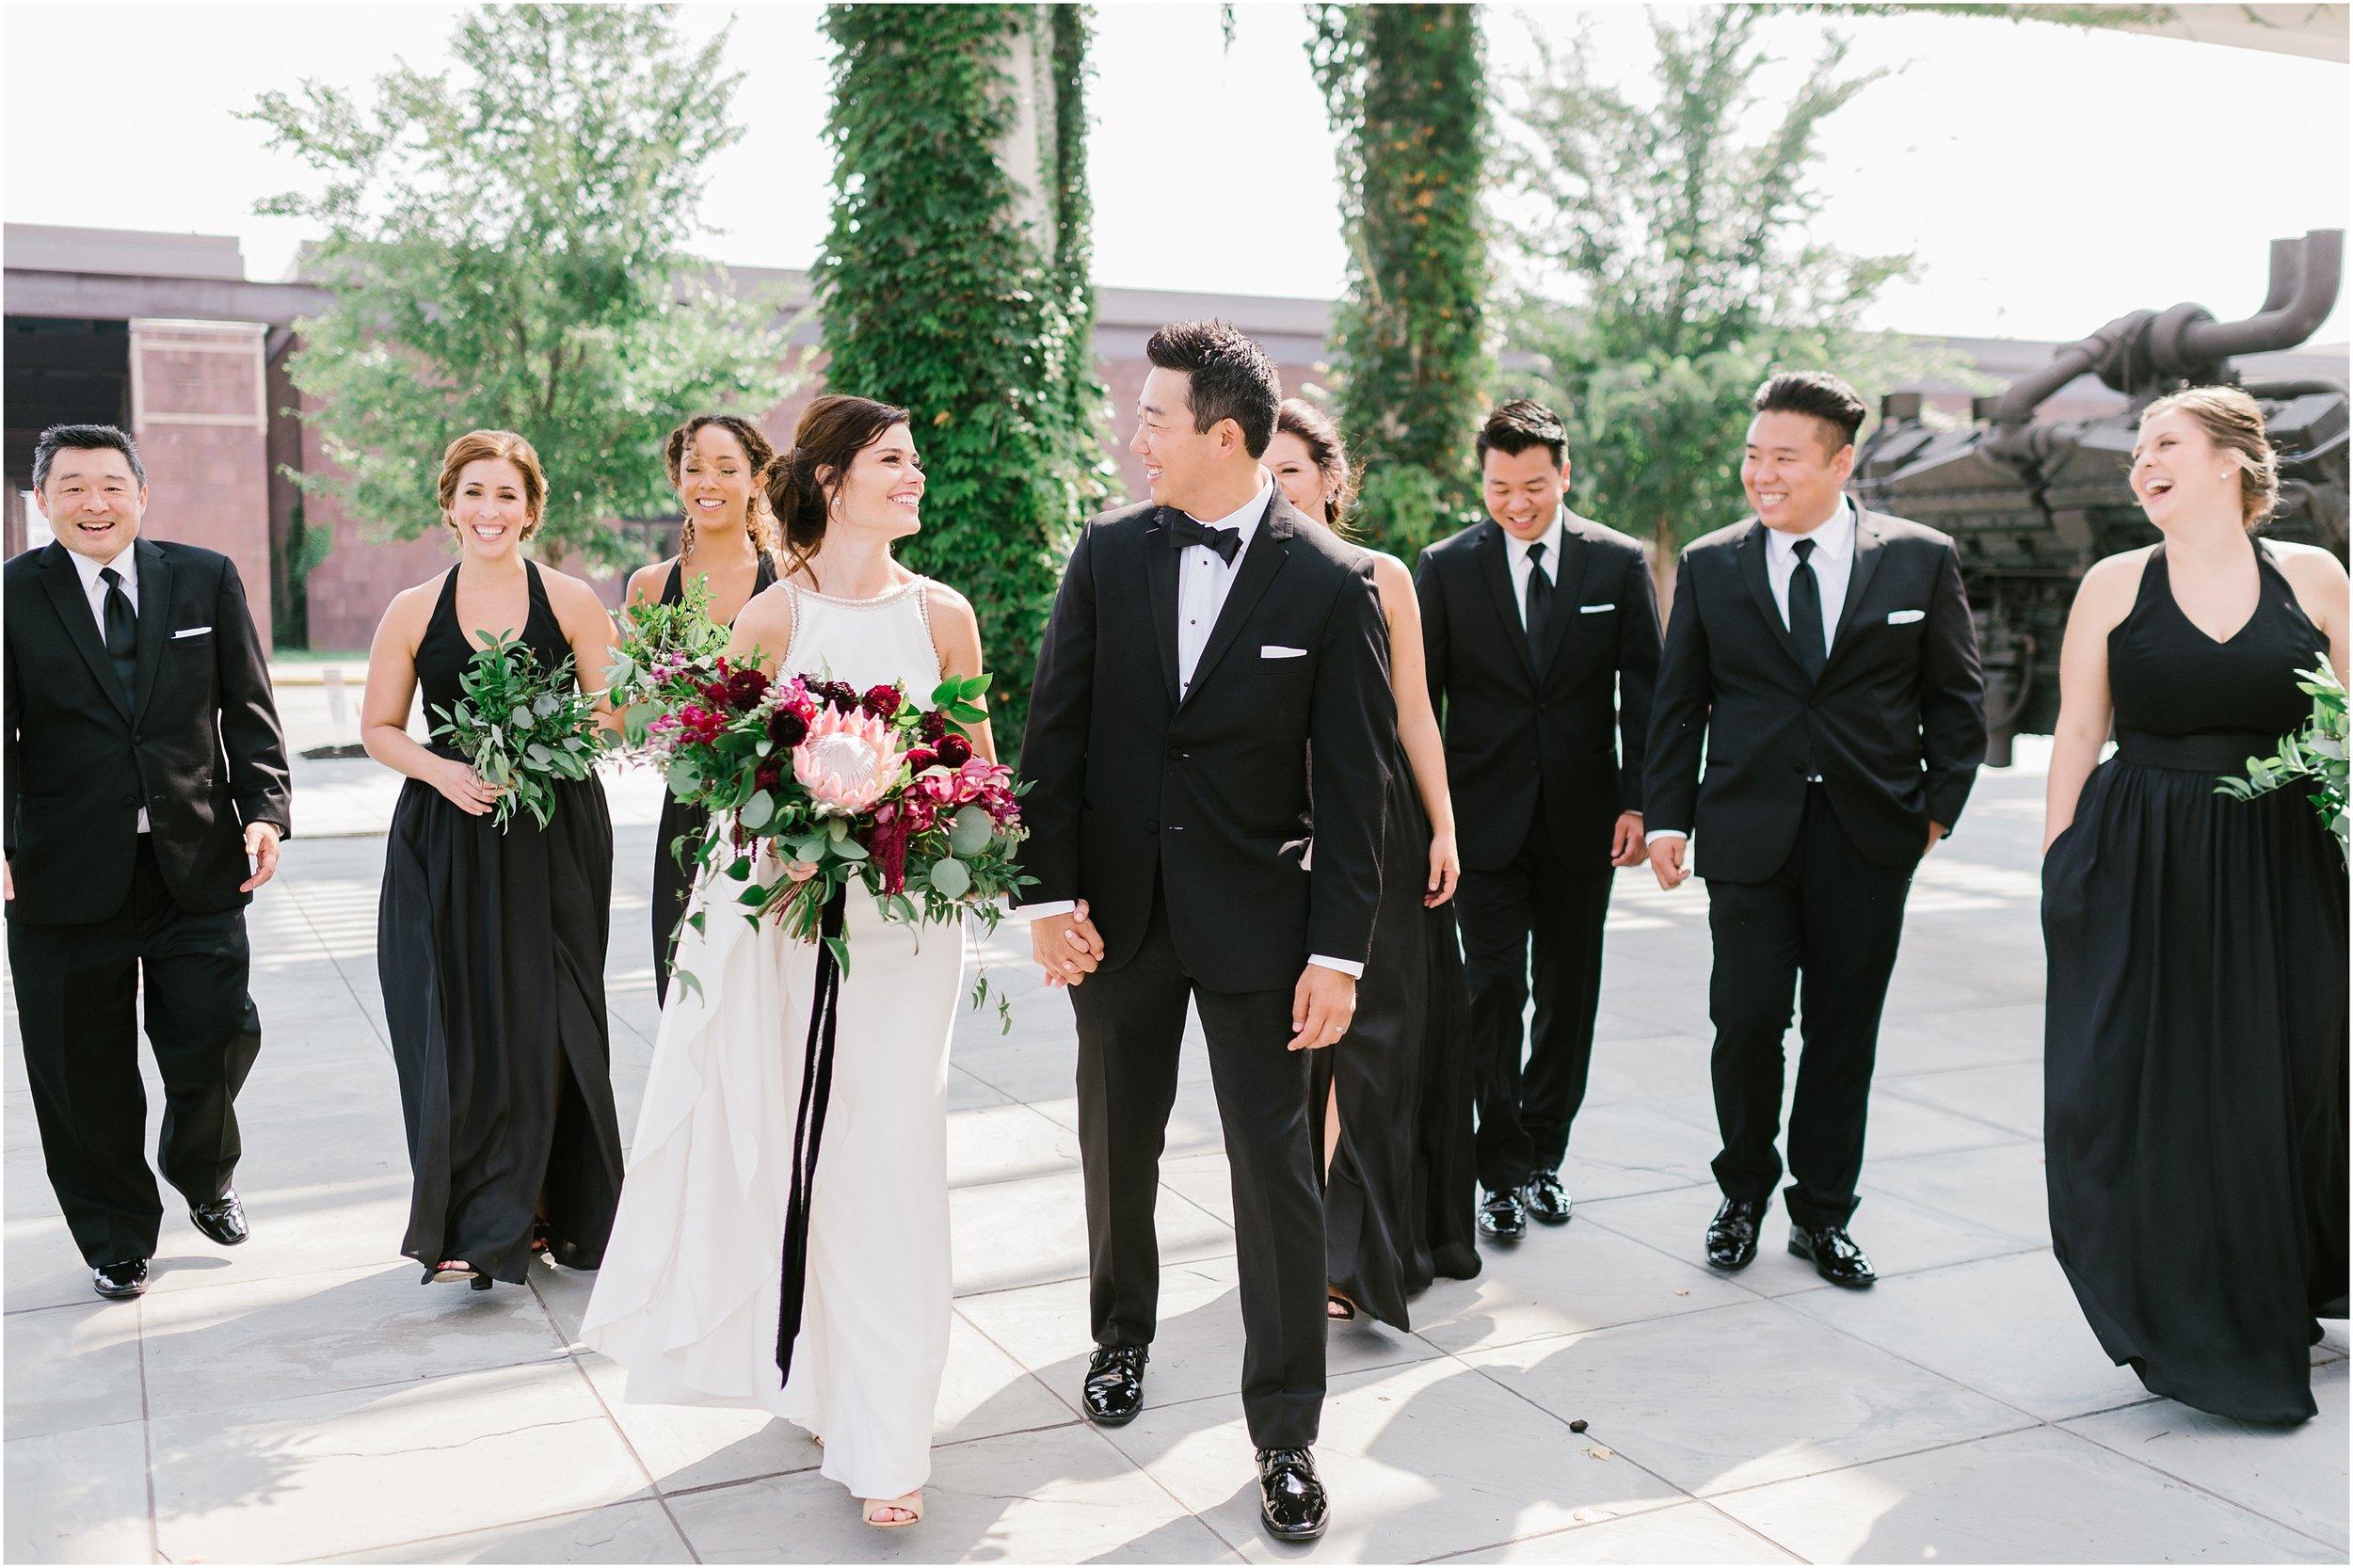 Rebecca_Shehorn_Photography_Indianapolis Wedding Photographer Sycamore at Mallow Run Wedding_9738.jpg